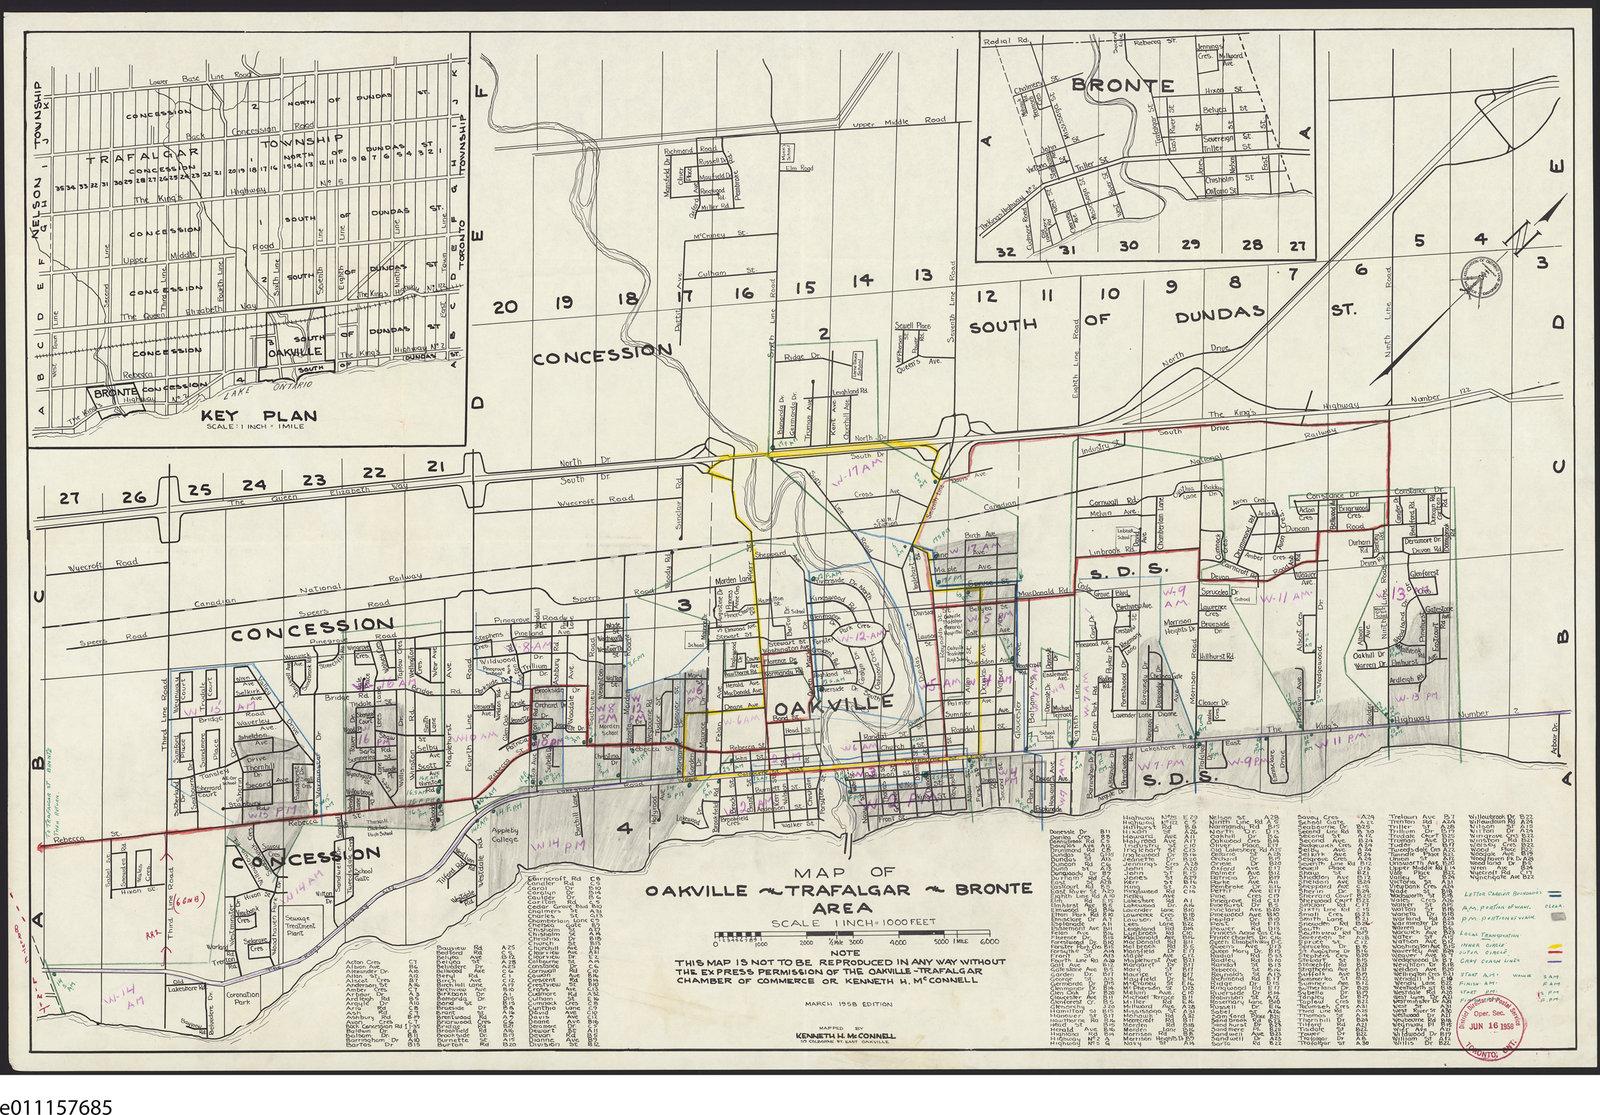 1958 Map Oakville Trafalgar Bronte Area